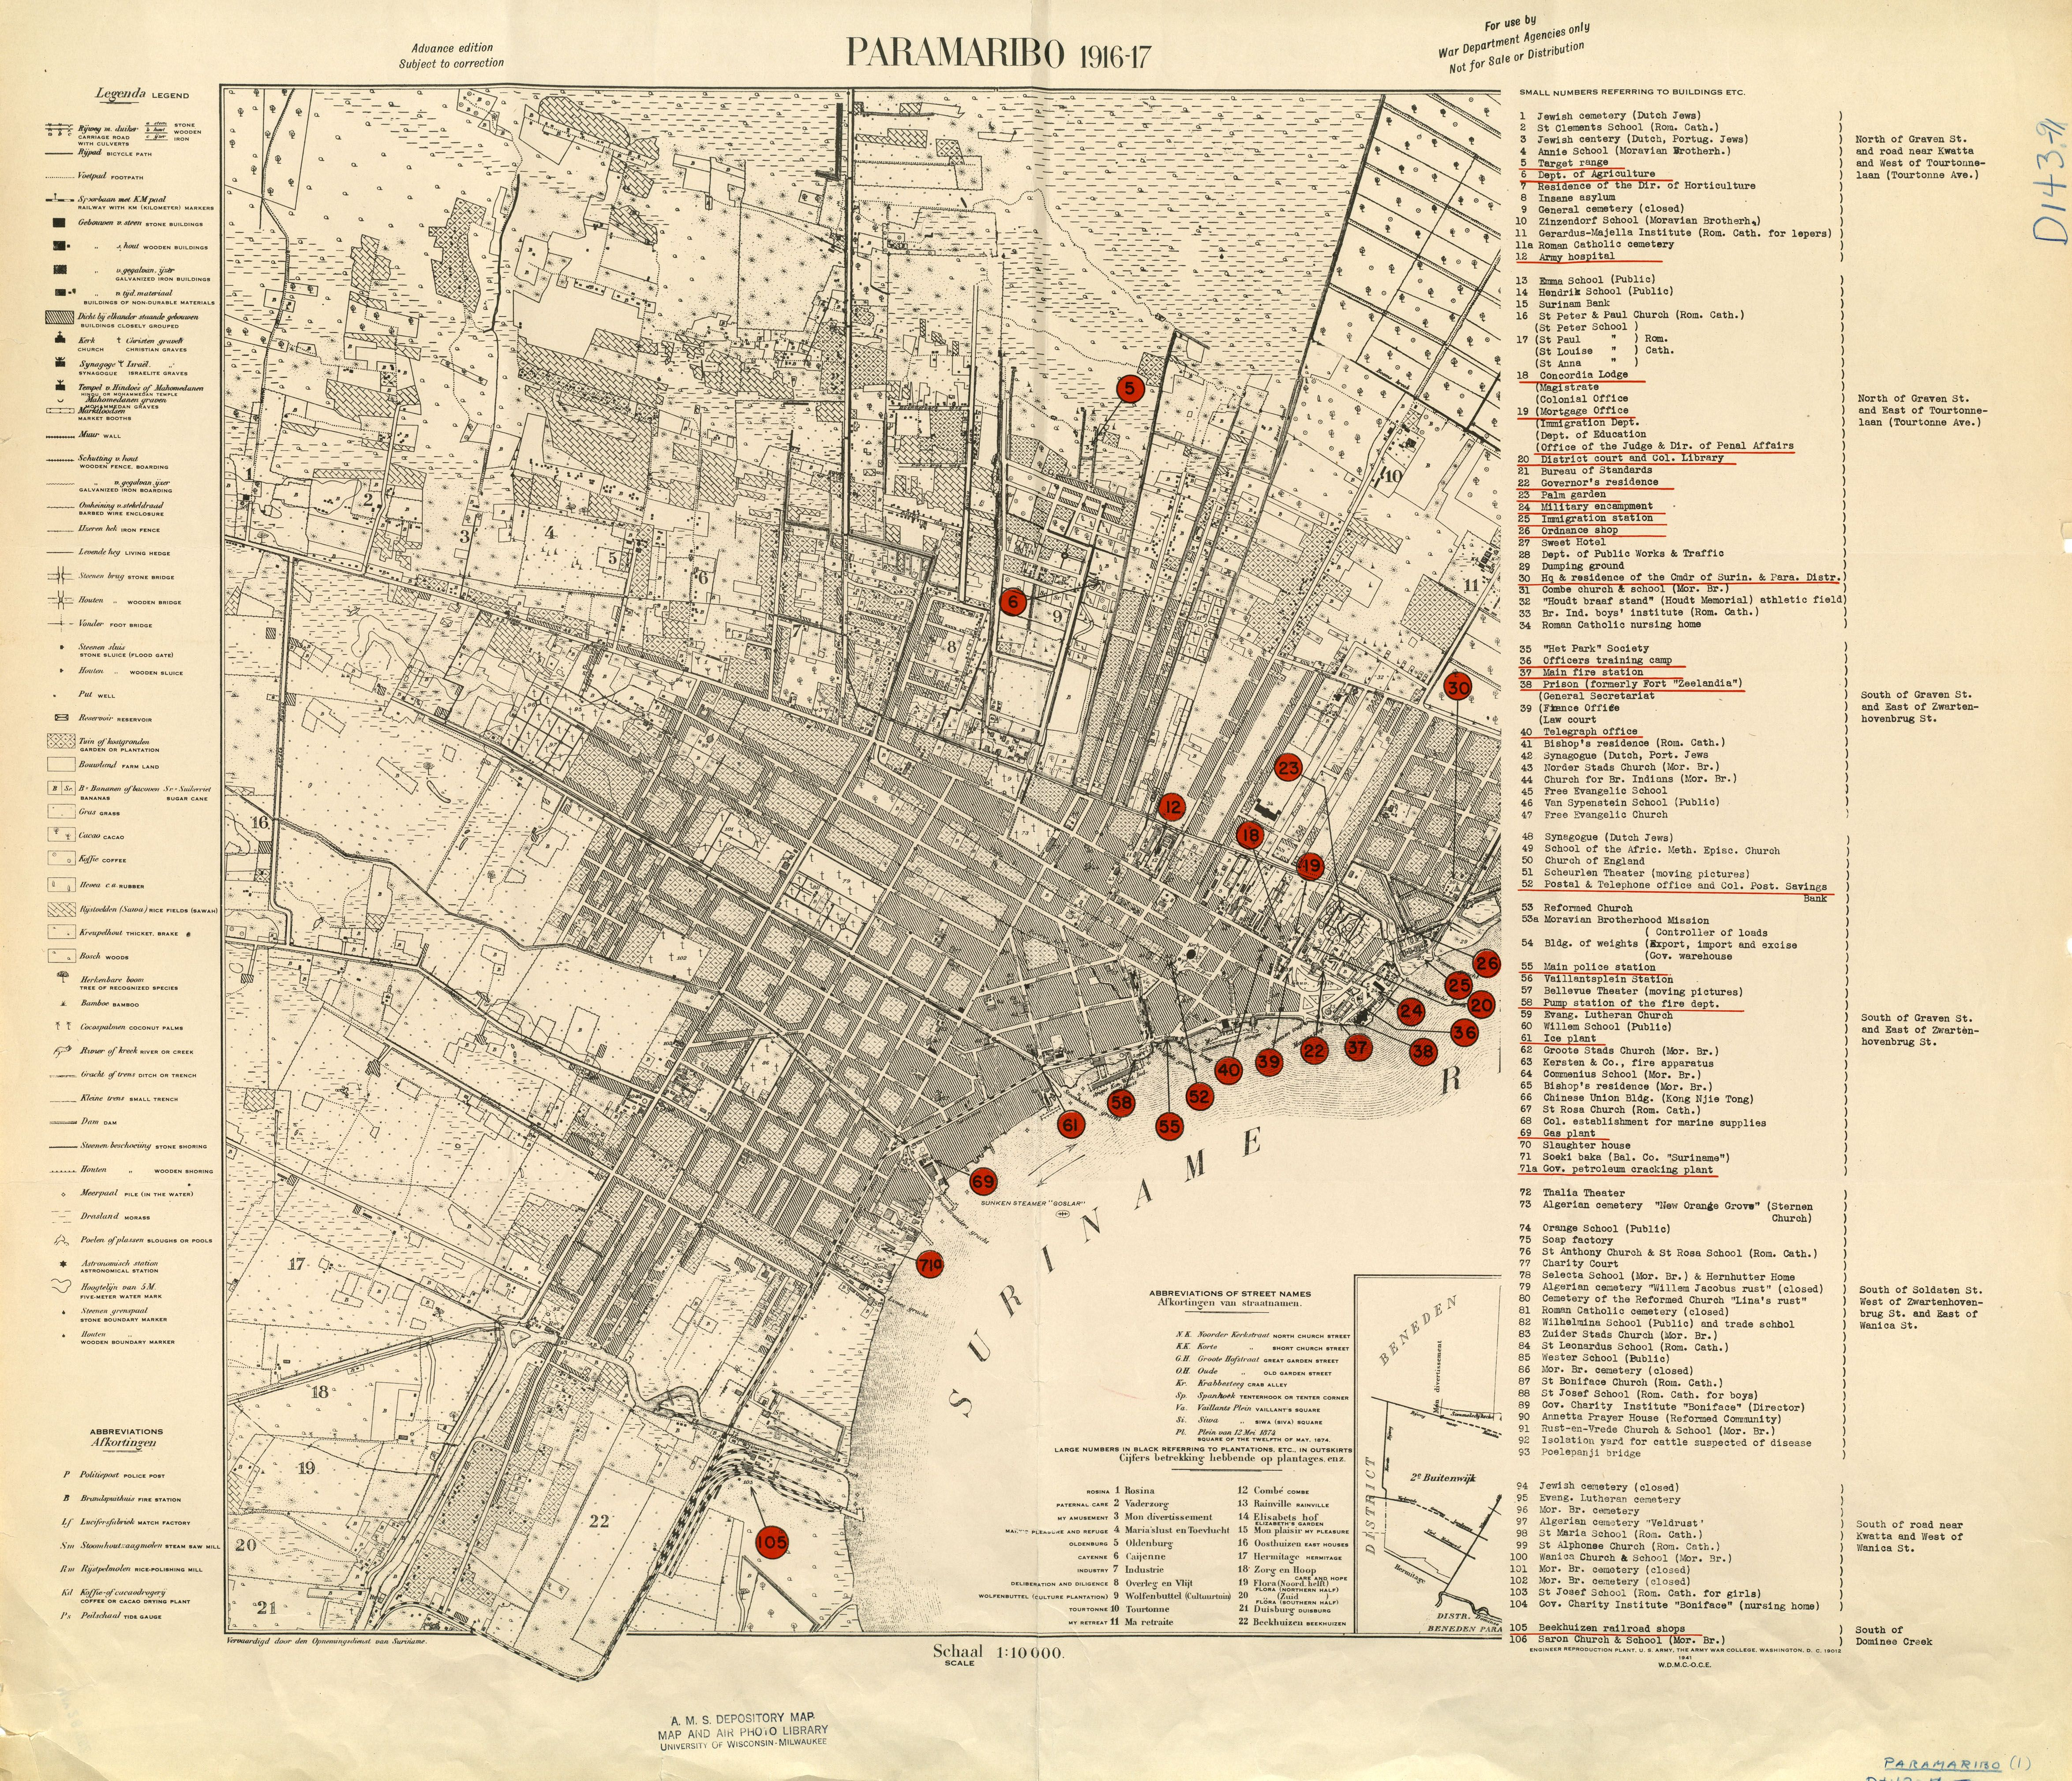 Paramaribo Capital City Of Suriname 1916 17 Map Surinam